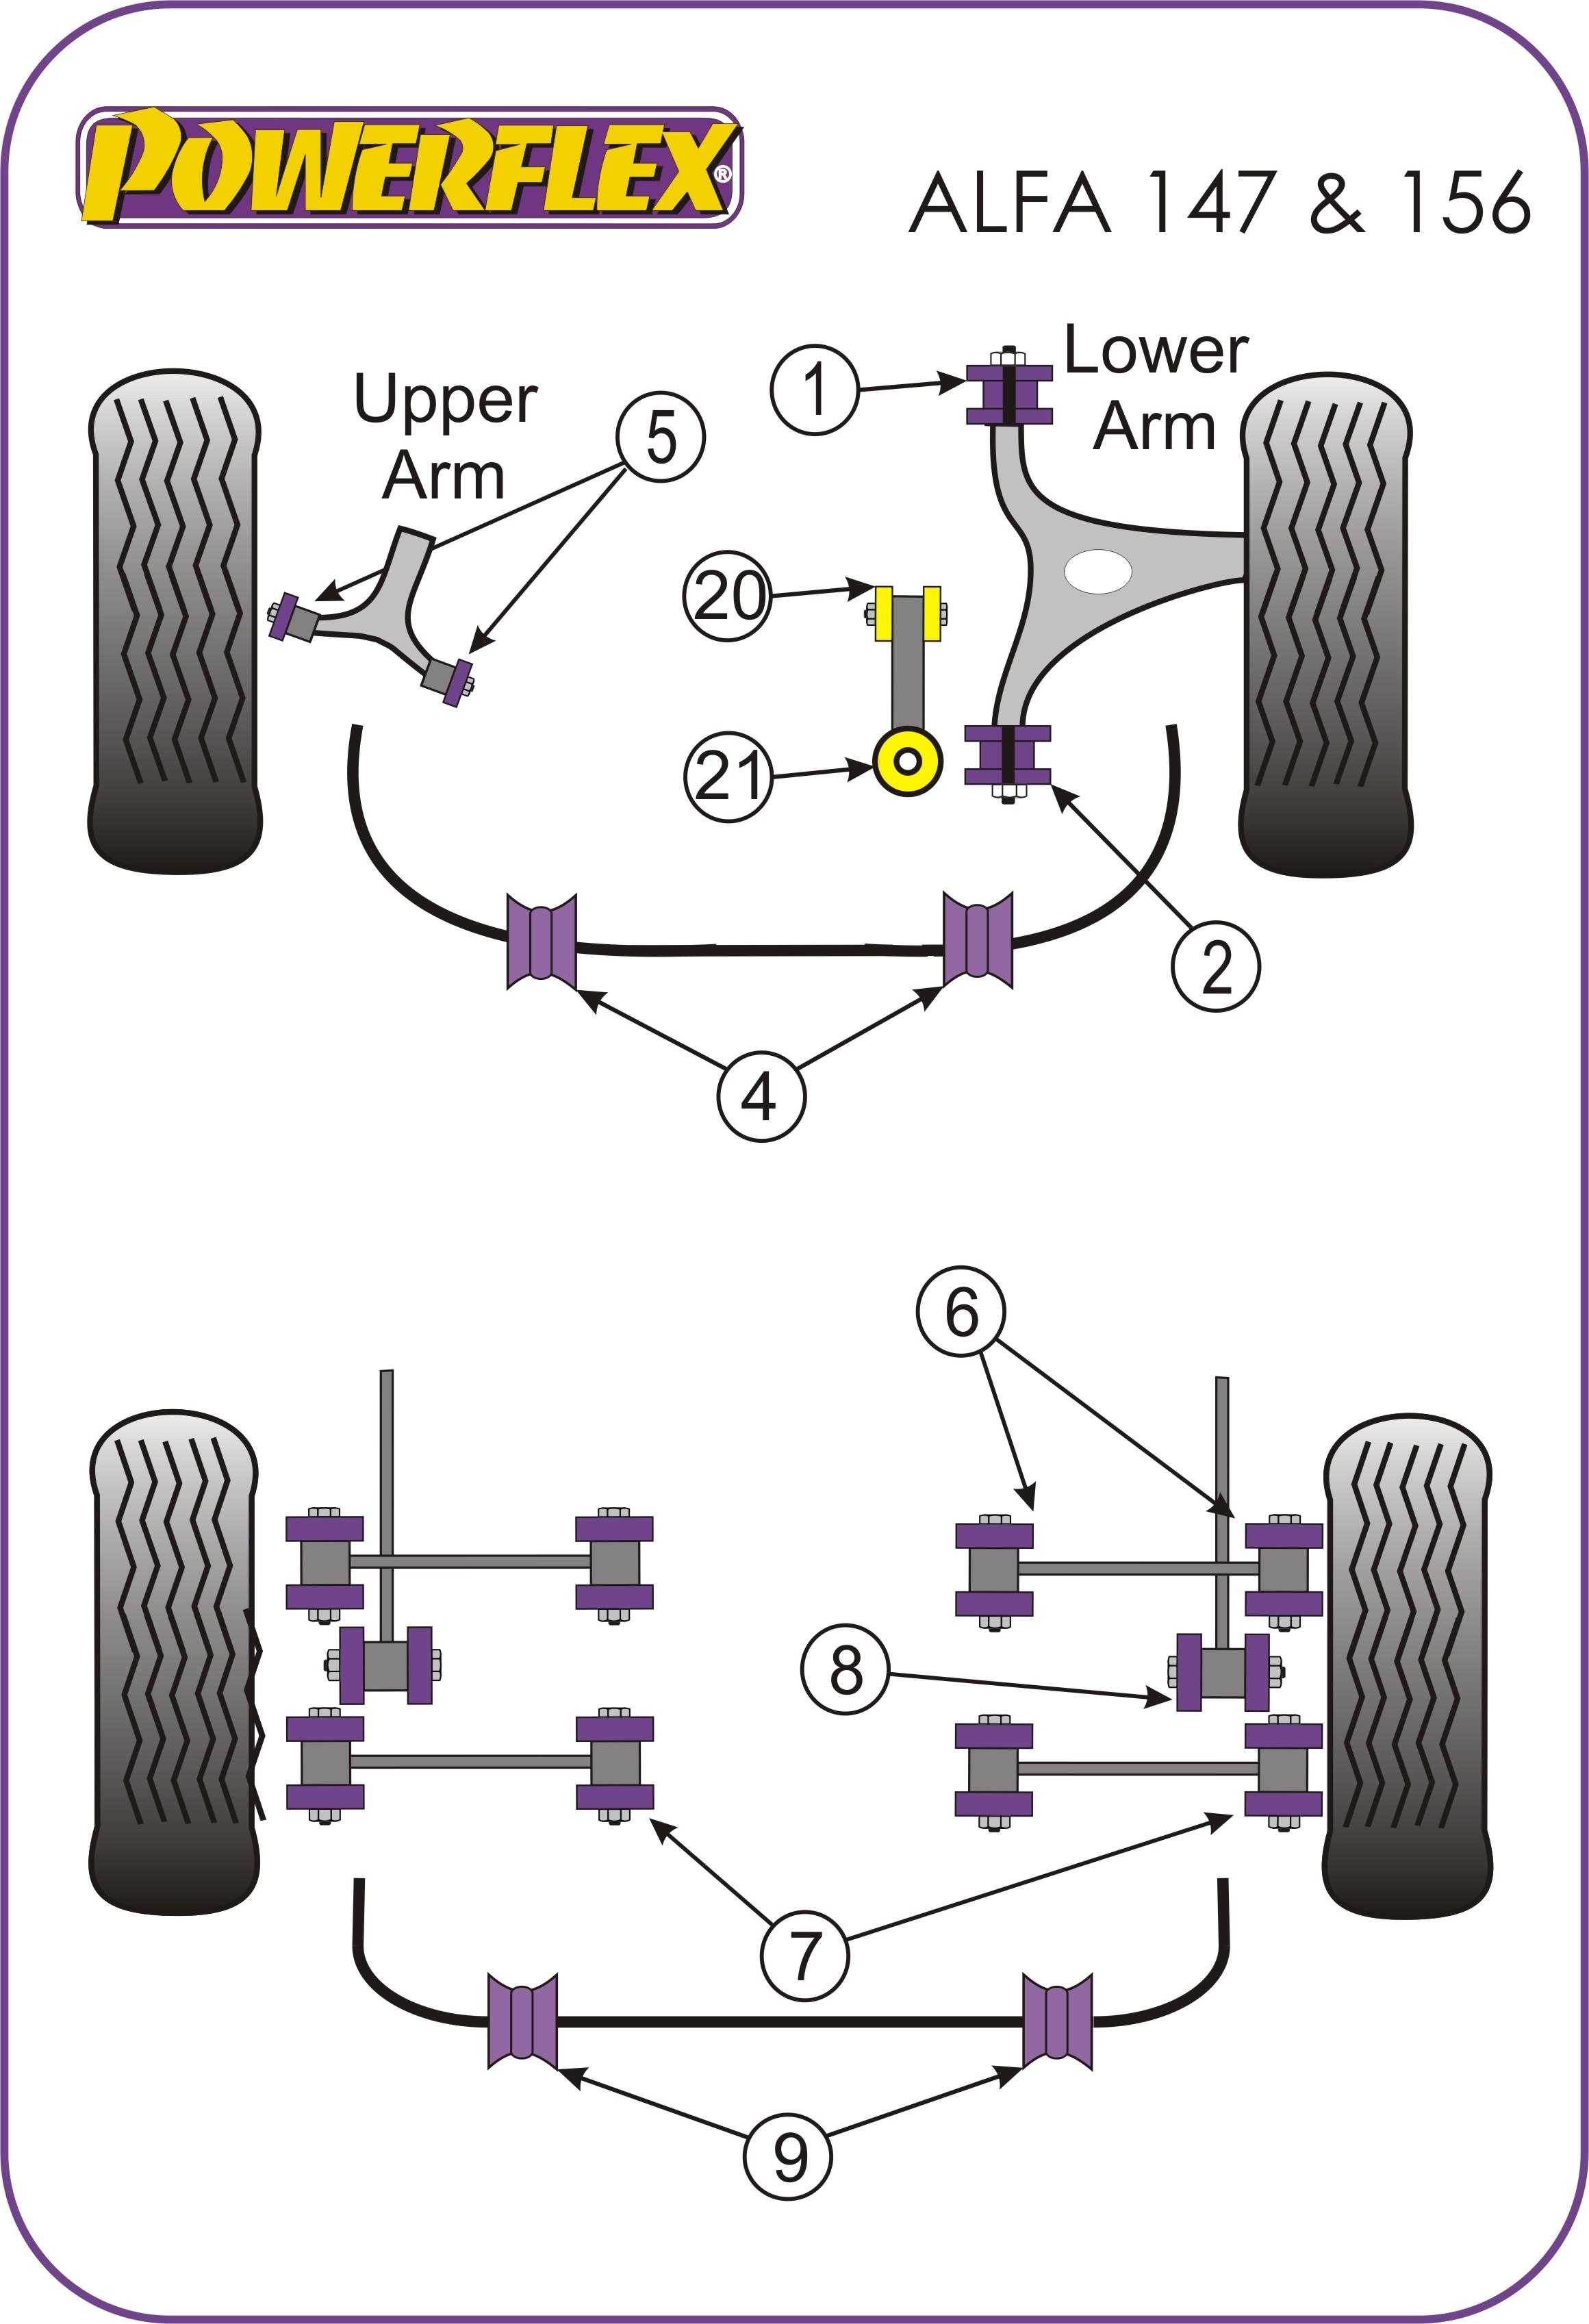 Powerflex Polyurethane Suspension Bushes Mercedes Benz Alfa Romeo 145 Wiring Diagram 147 156